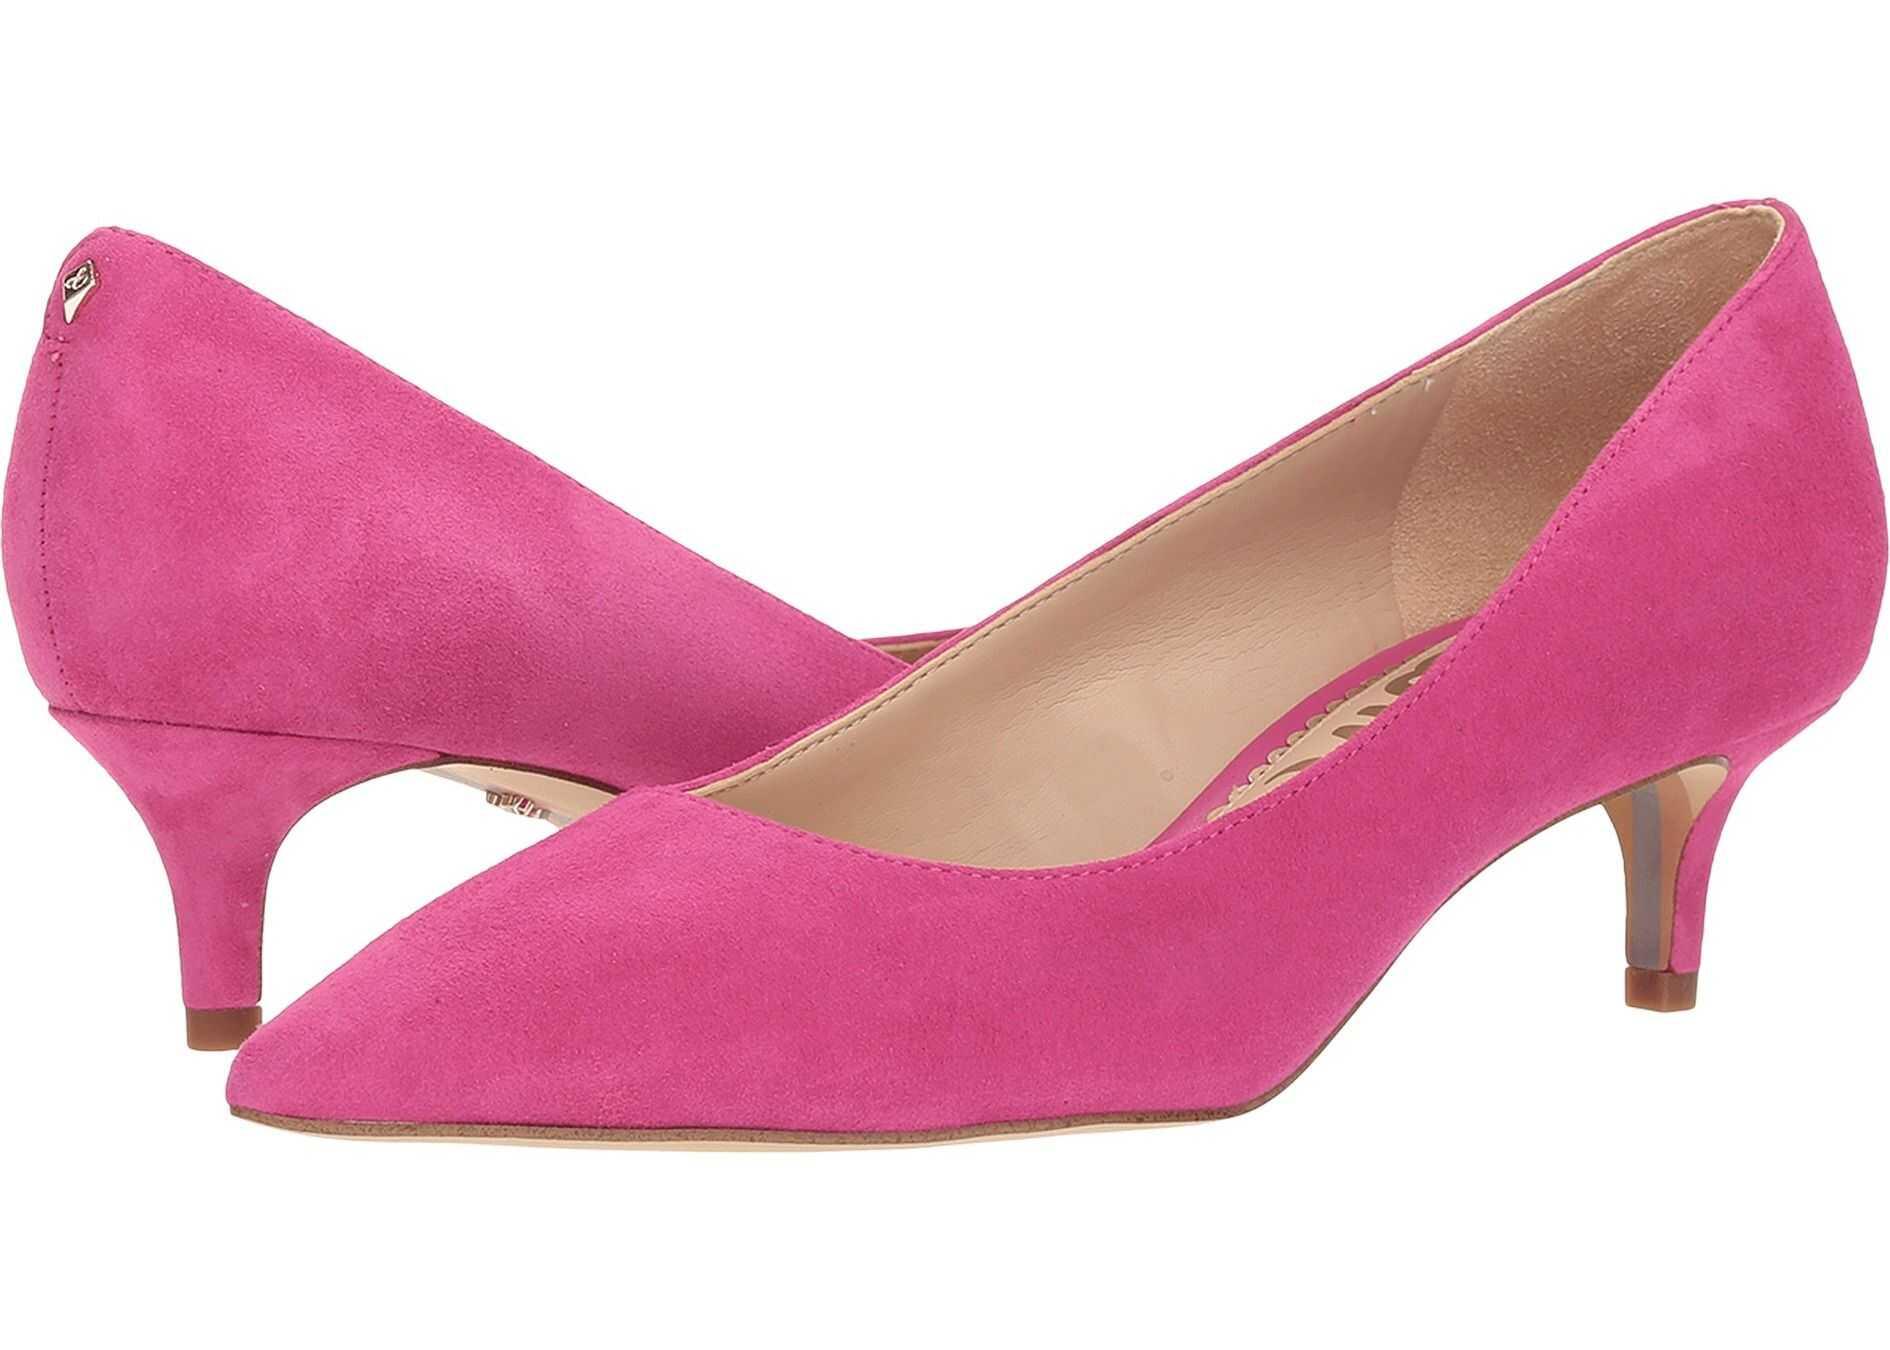 Sam Edelman Dori Retro Pink Suede Leather